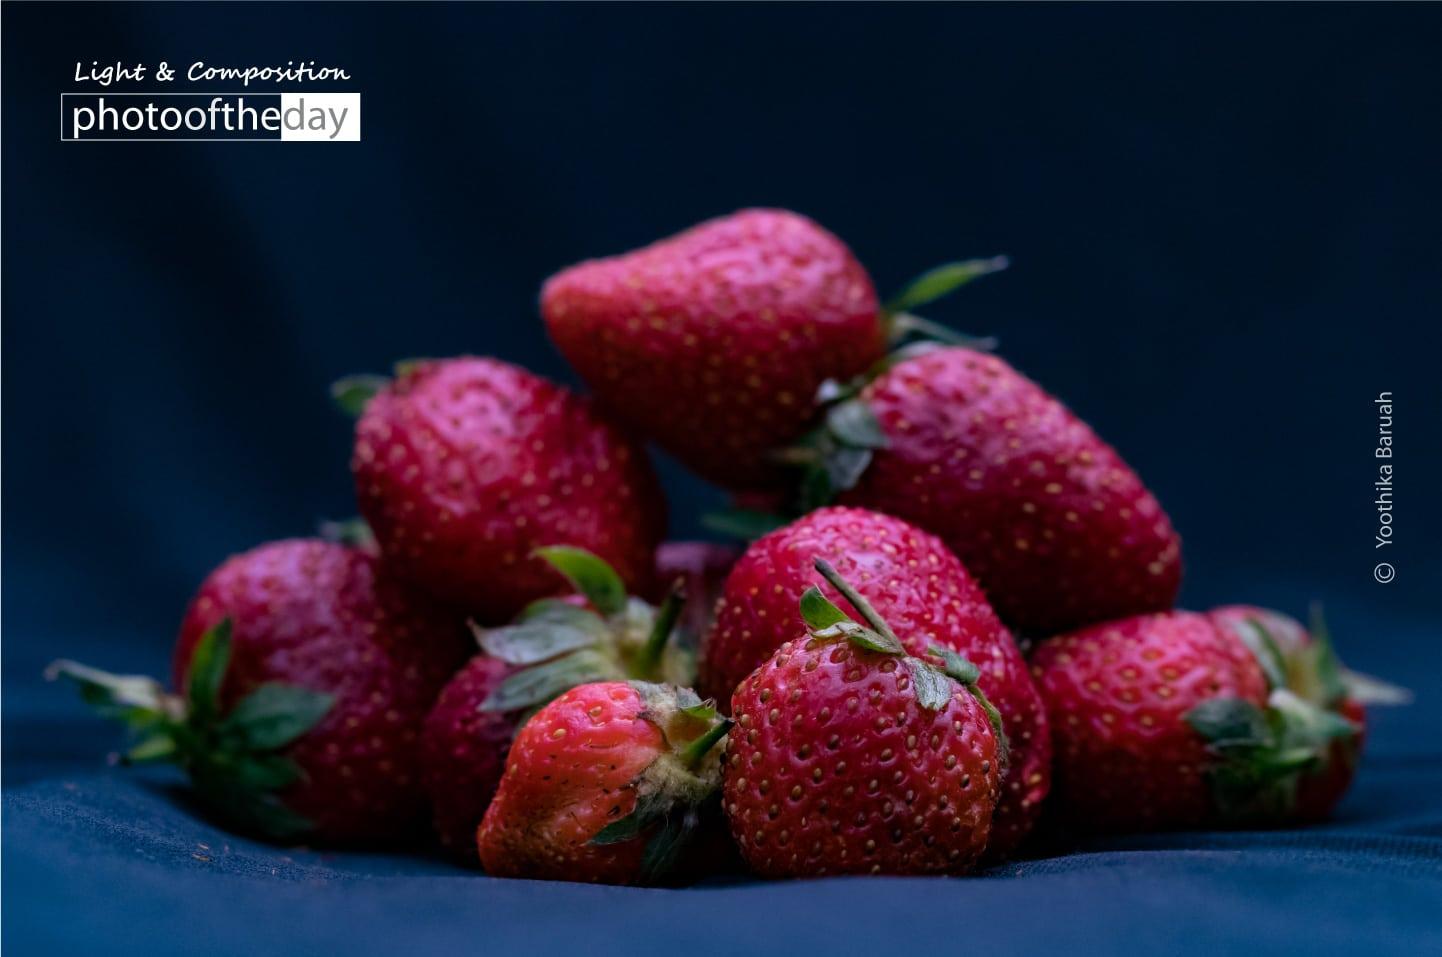 The Strawberries by Yoothika Baruah